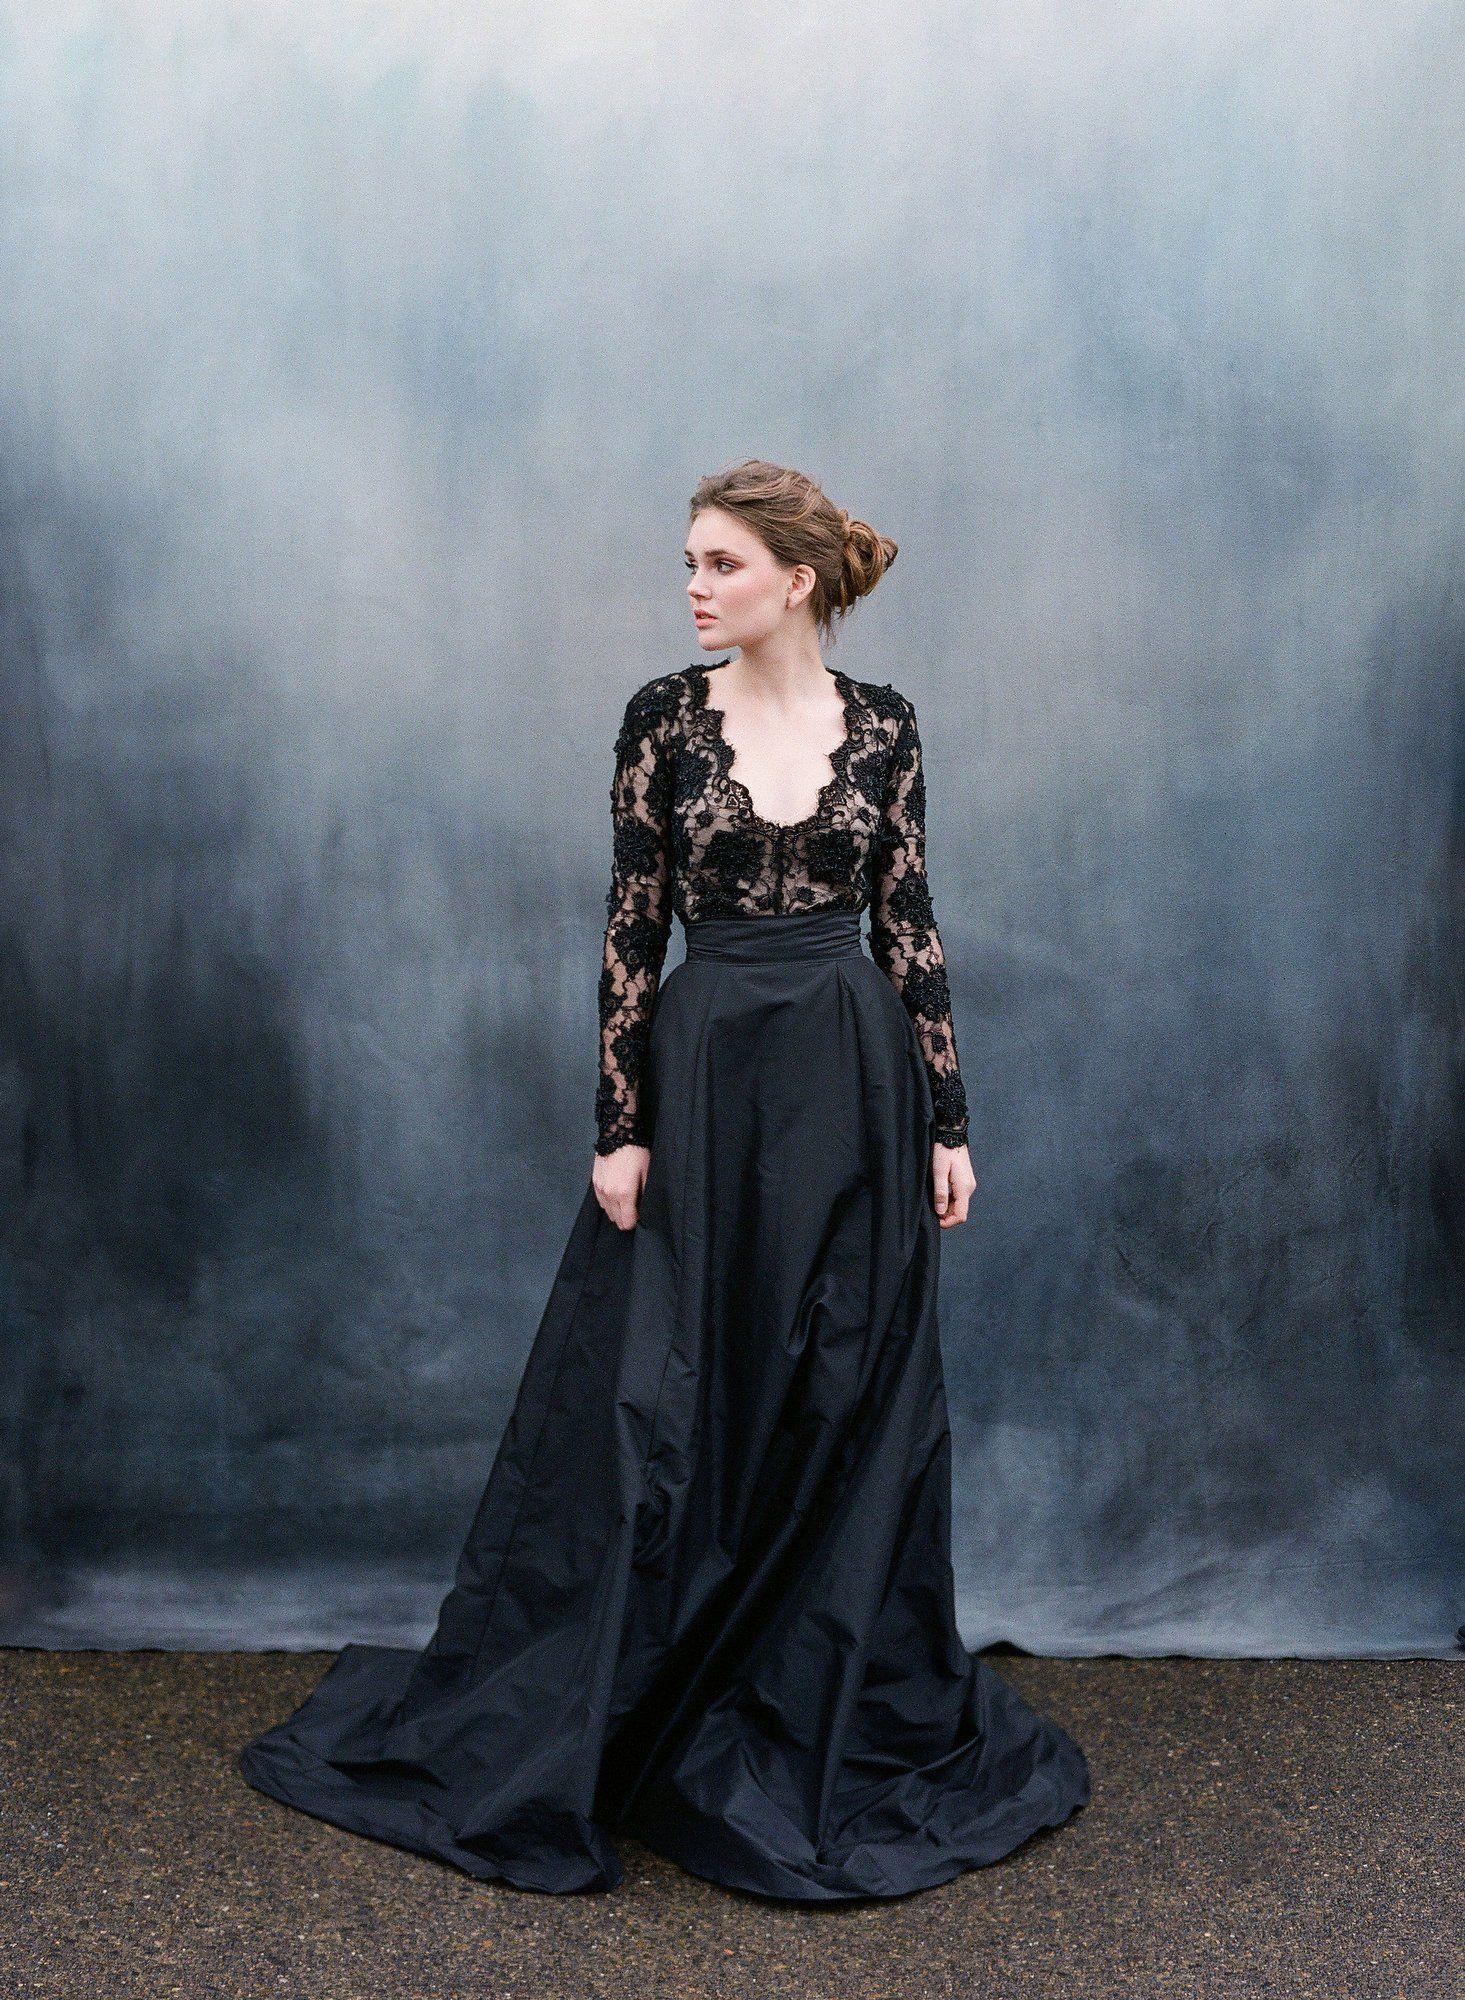 30 of the most stunning black wedding dresses black wedding 30 of the most stunning black wedding dresses junglespirit Choice Image